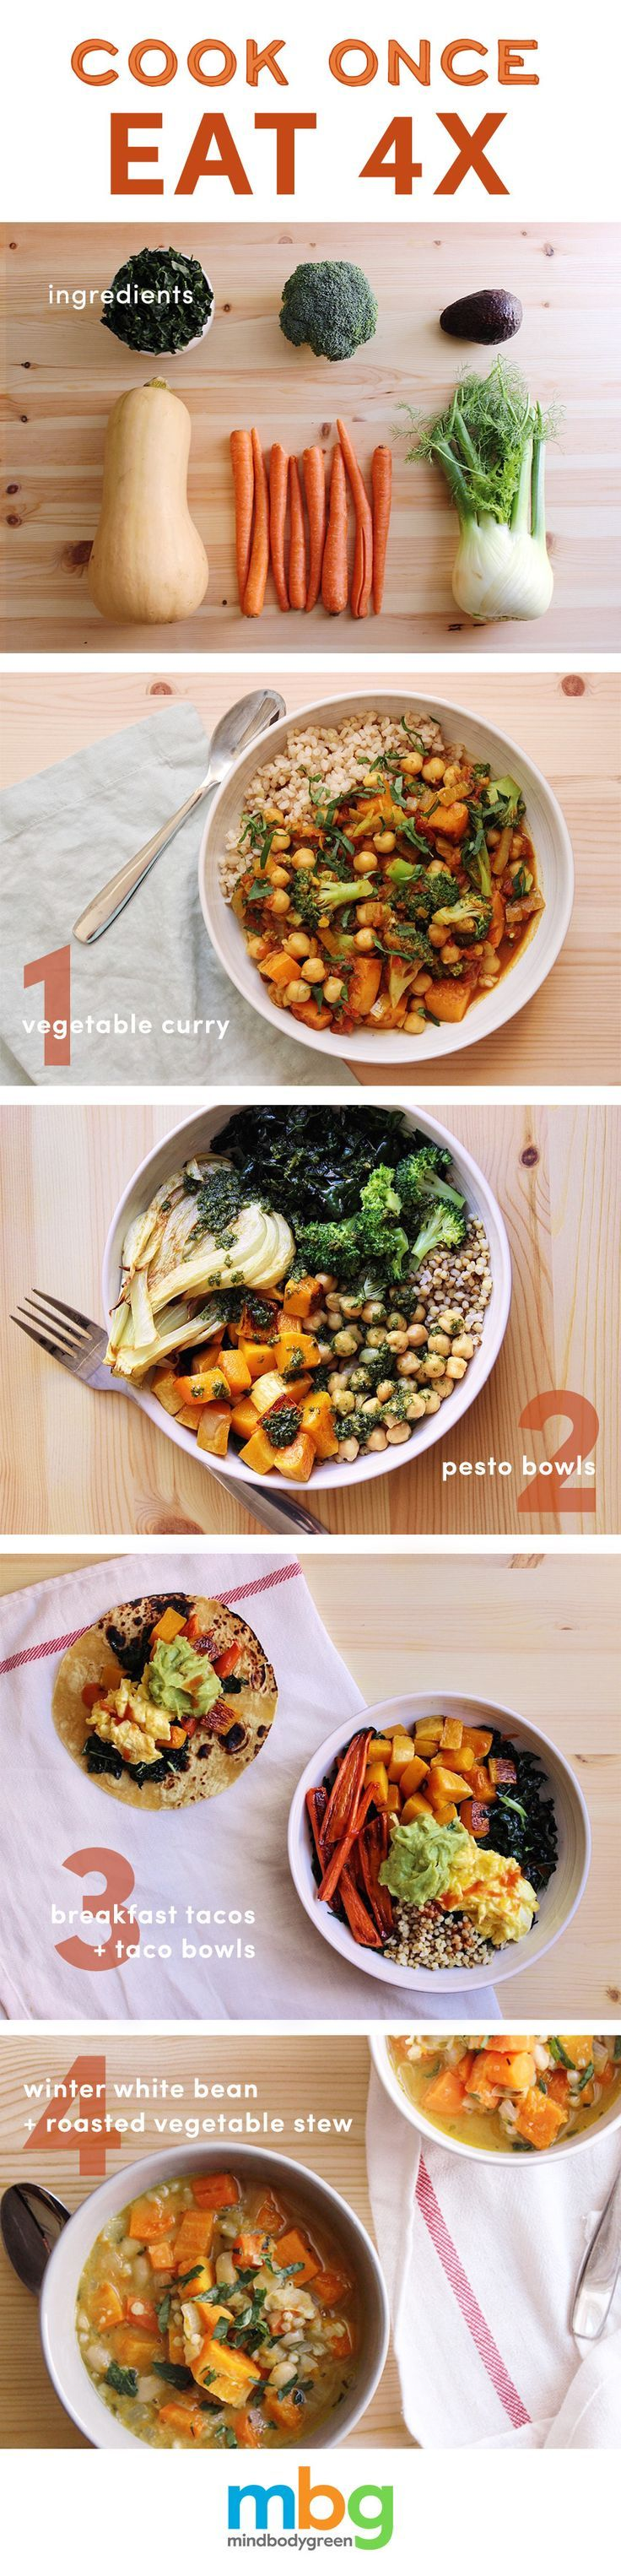 Meal prep like a boss. Shopping list: butternut squash, carrots, fennel, broccoli, spinach, kale, avocado, eggs, onions, rosemary, thyme, cilantro or parsley, oil, white beans (x3), pesto, cumin, garam masala, curry, turmeric, cayenne pepper, salt and pepper